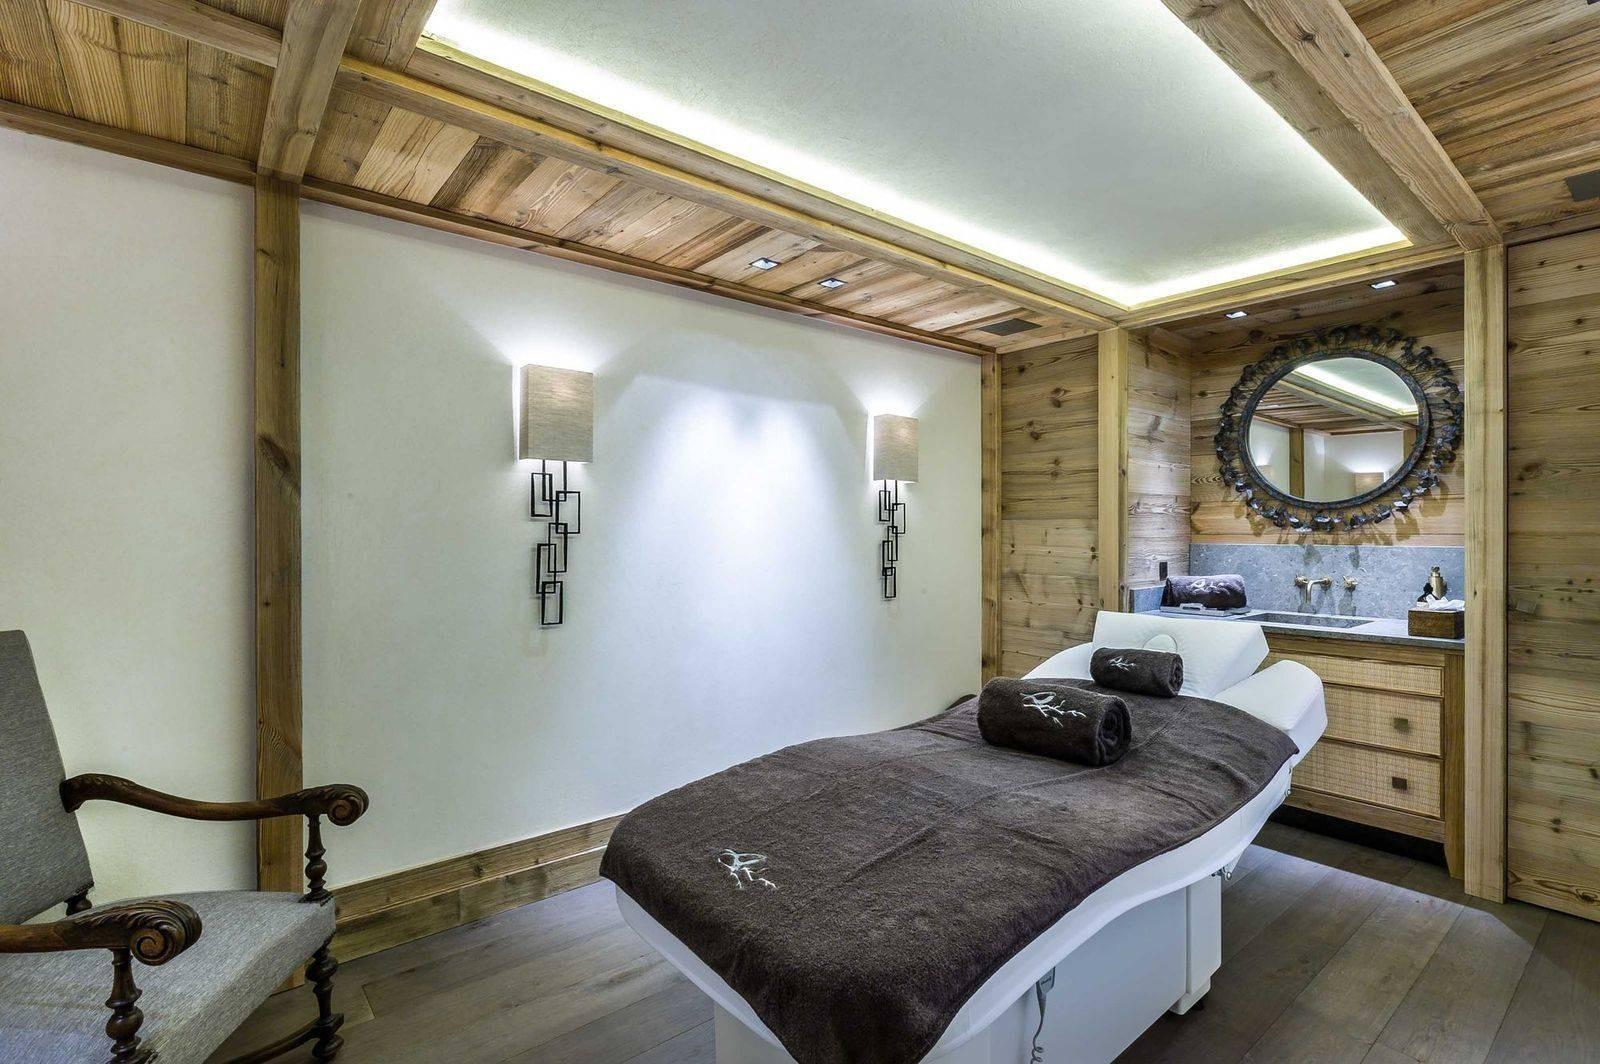 Courchevel 1850 Luxury Rental Chalet Chursinite Massage Room